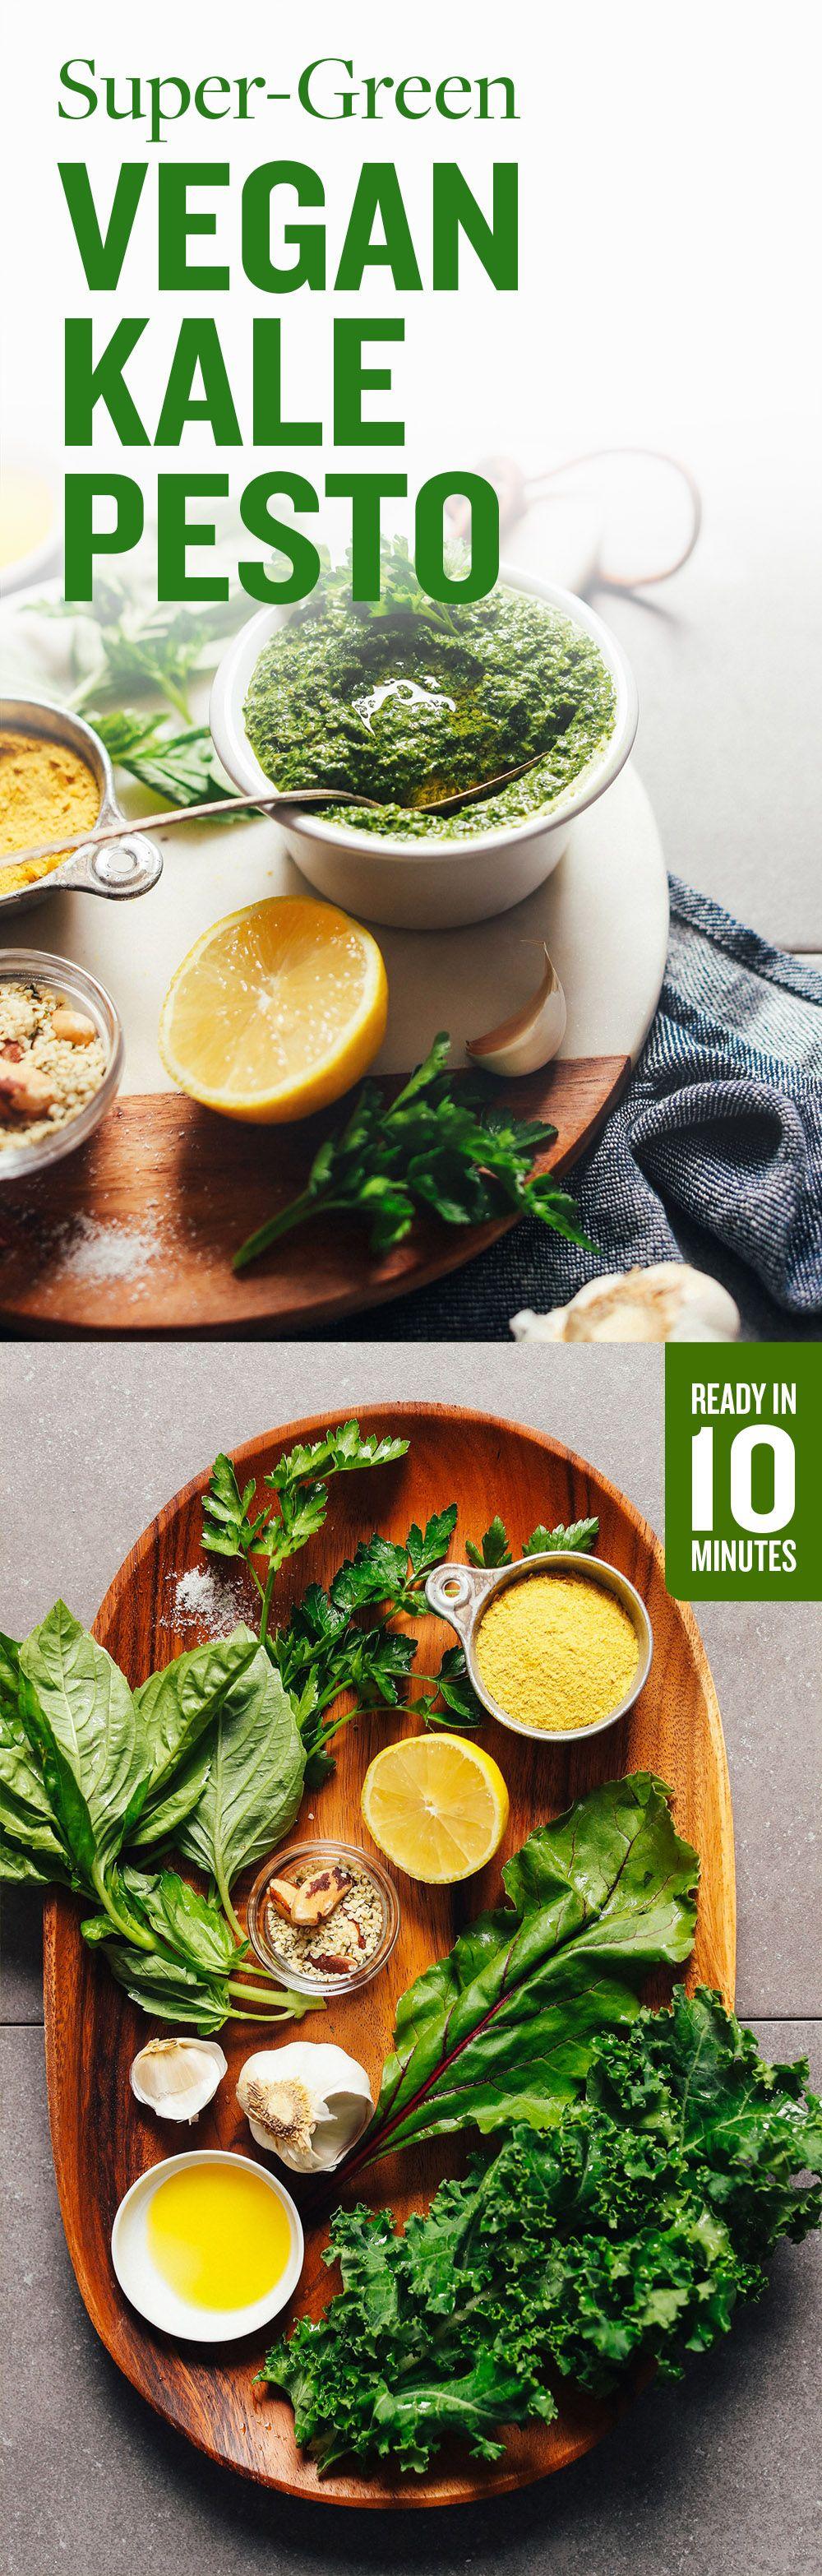 Vegan Recipes With Pesto